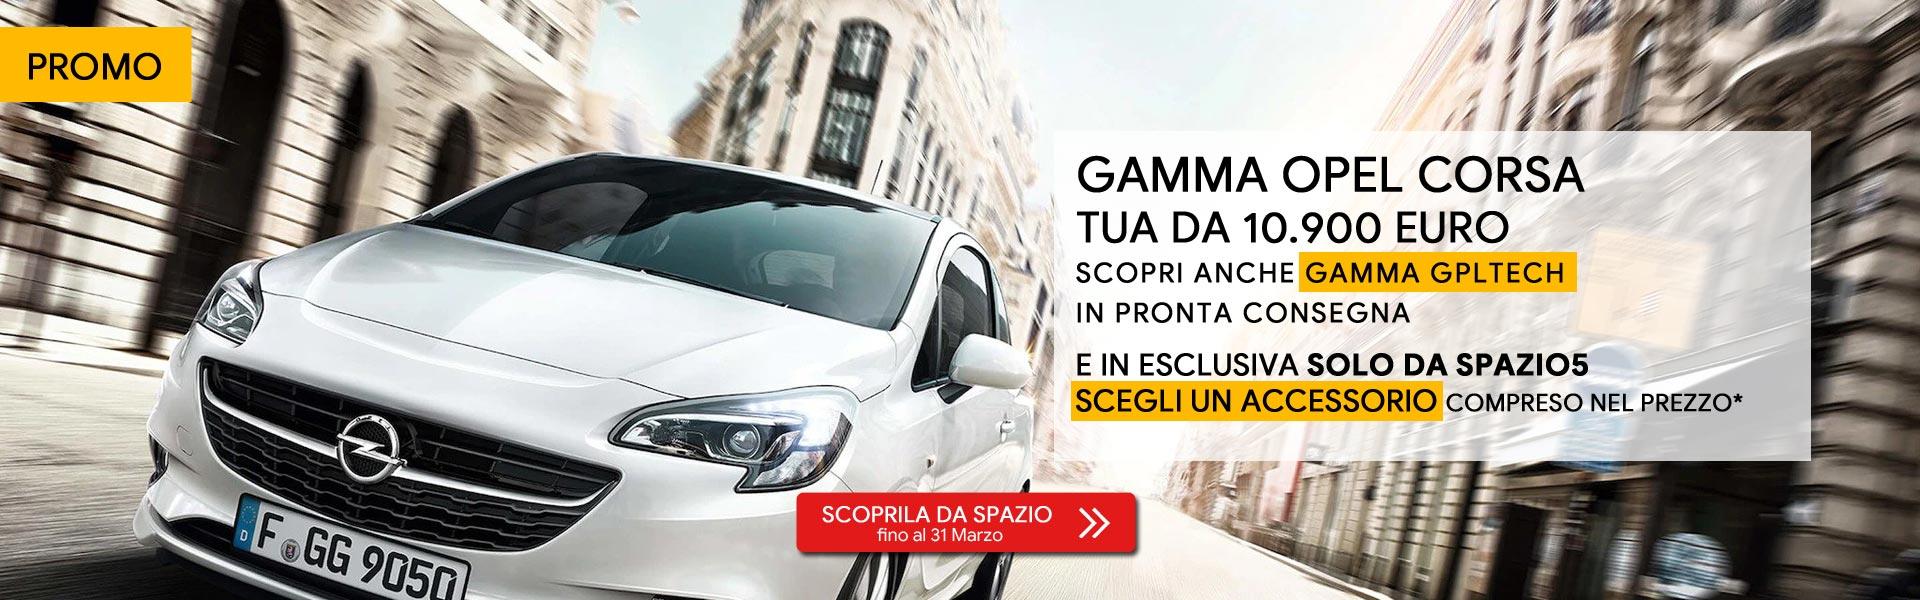 Opel Corsa Offerta Marzo